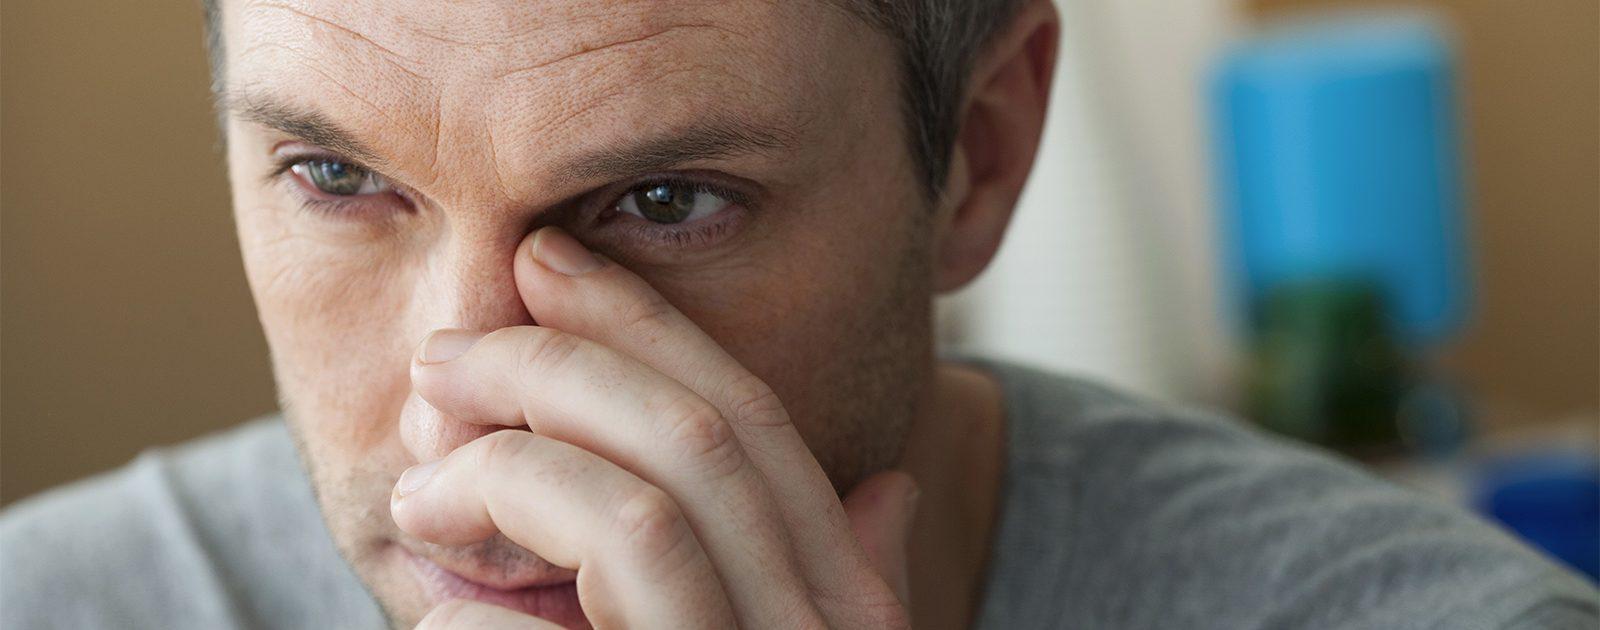 Mann, der an Rhinitis sicca leidet, fasst sich an die Nase.